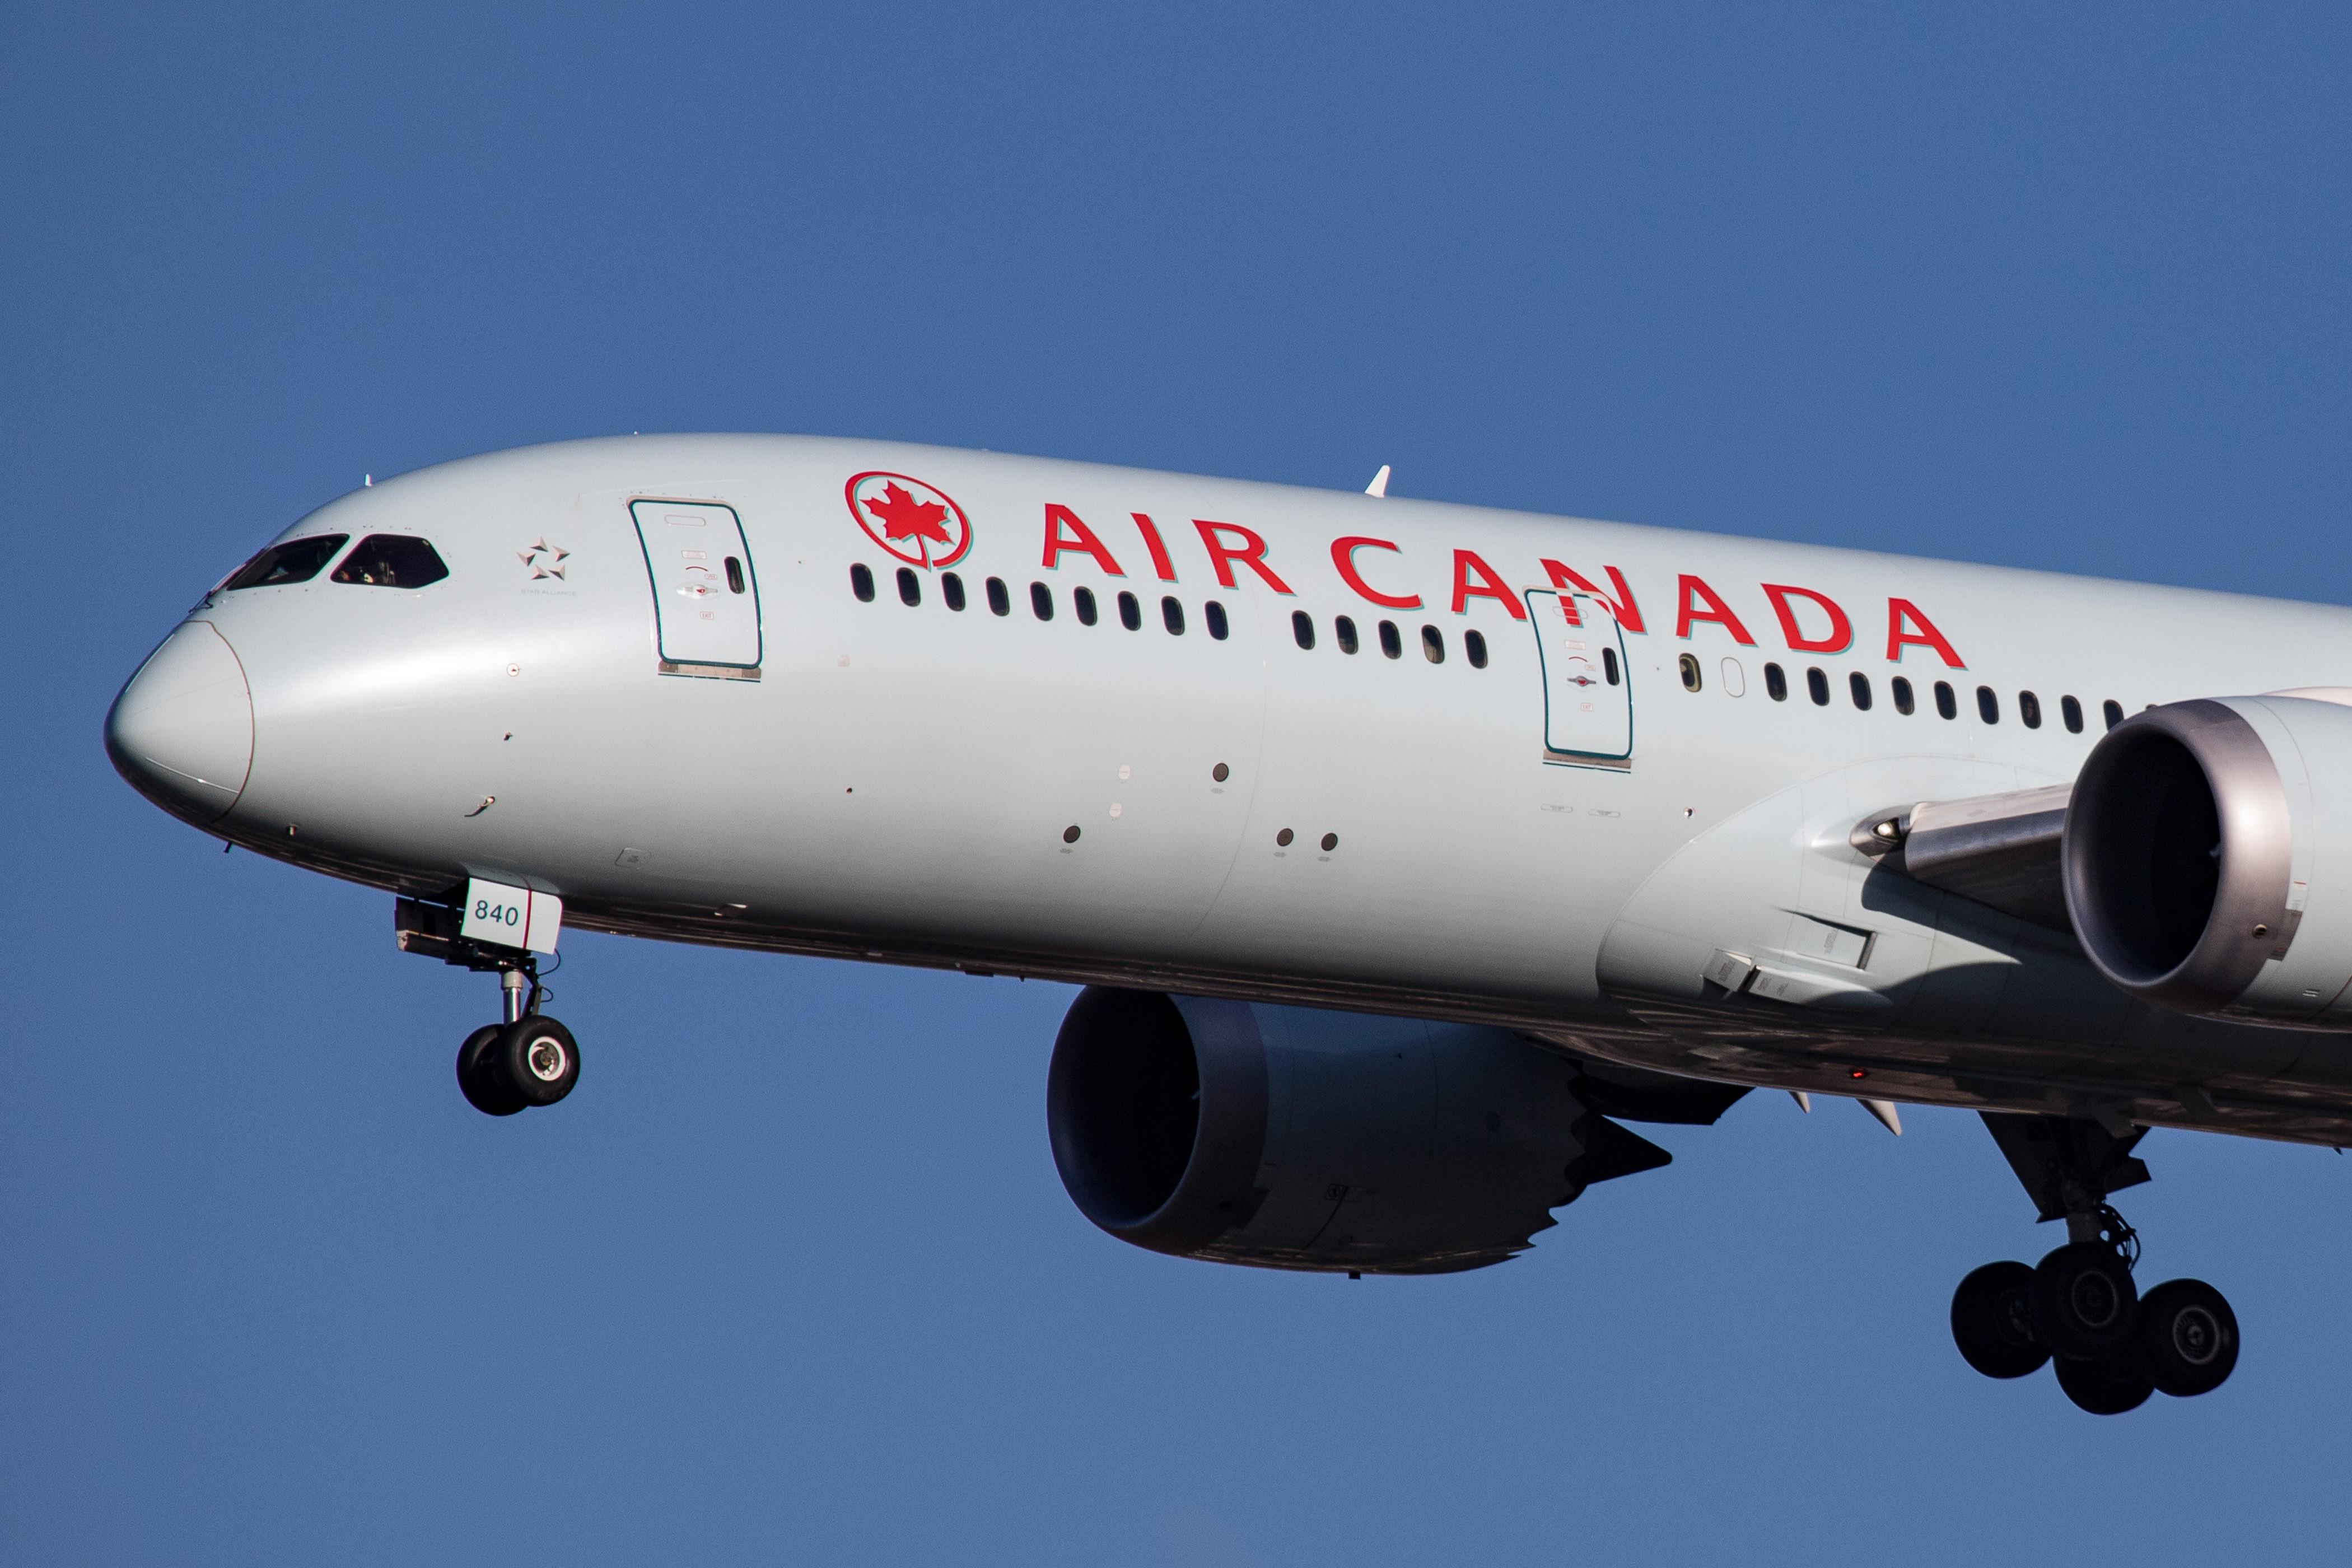 Air Canada Boeing 787 Dreamliner